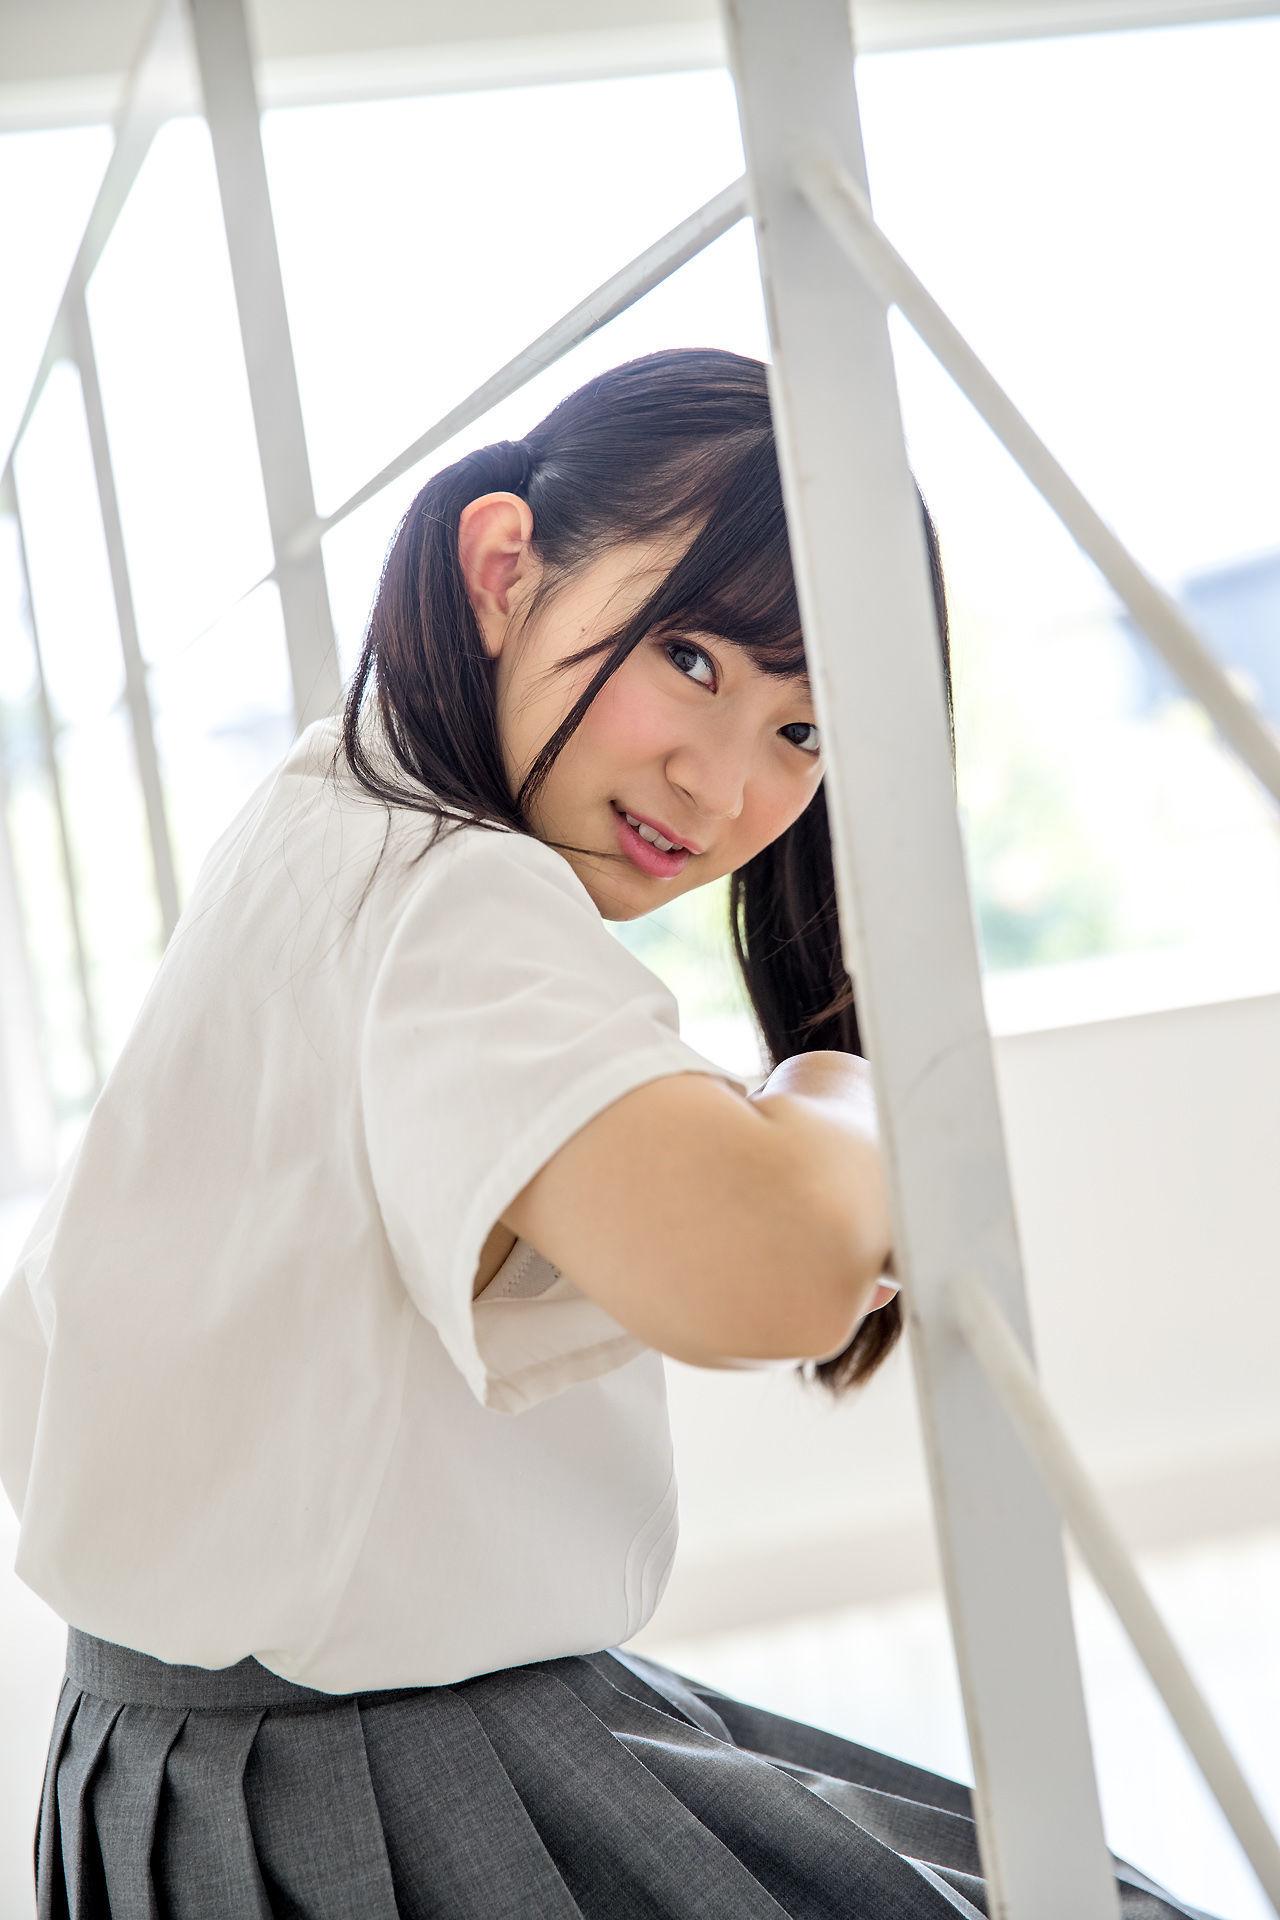 Miruku Kawamura 河村みるく- 双马尾校服少女